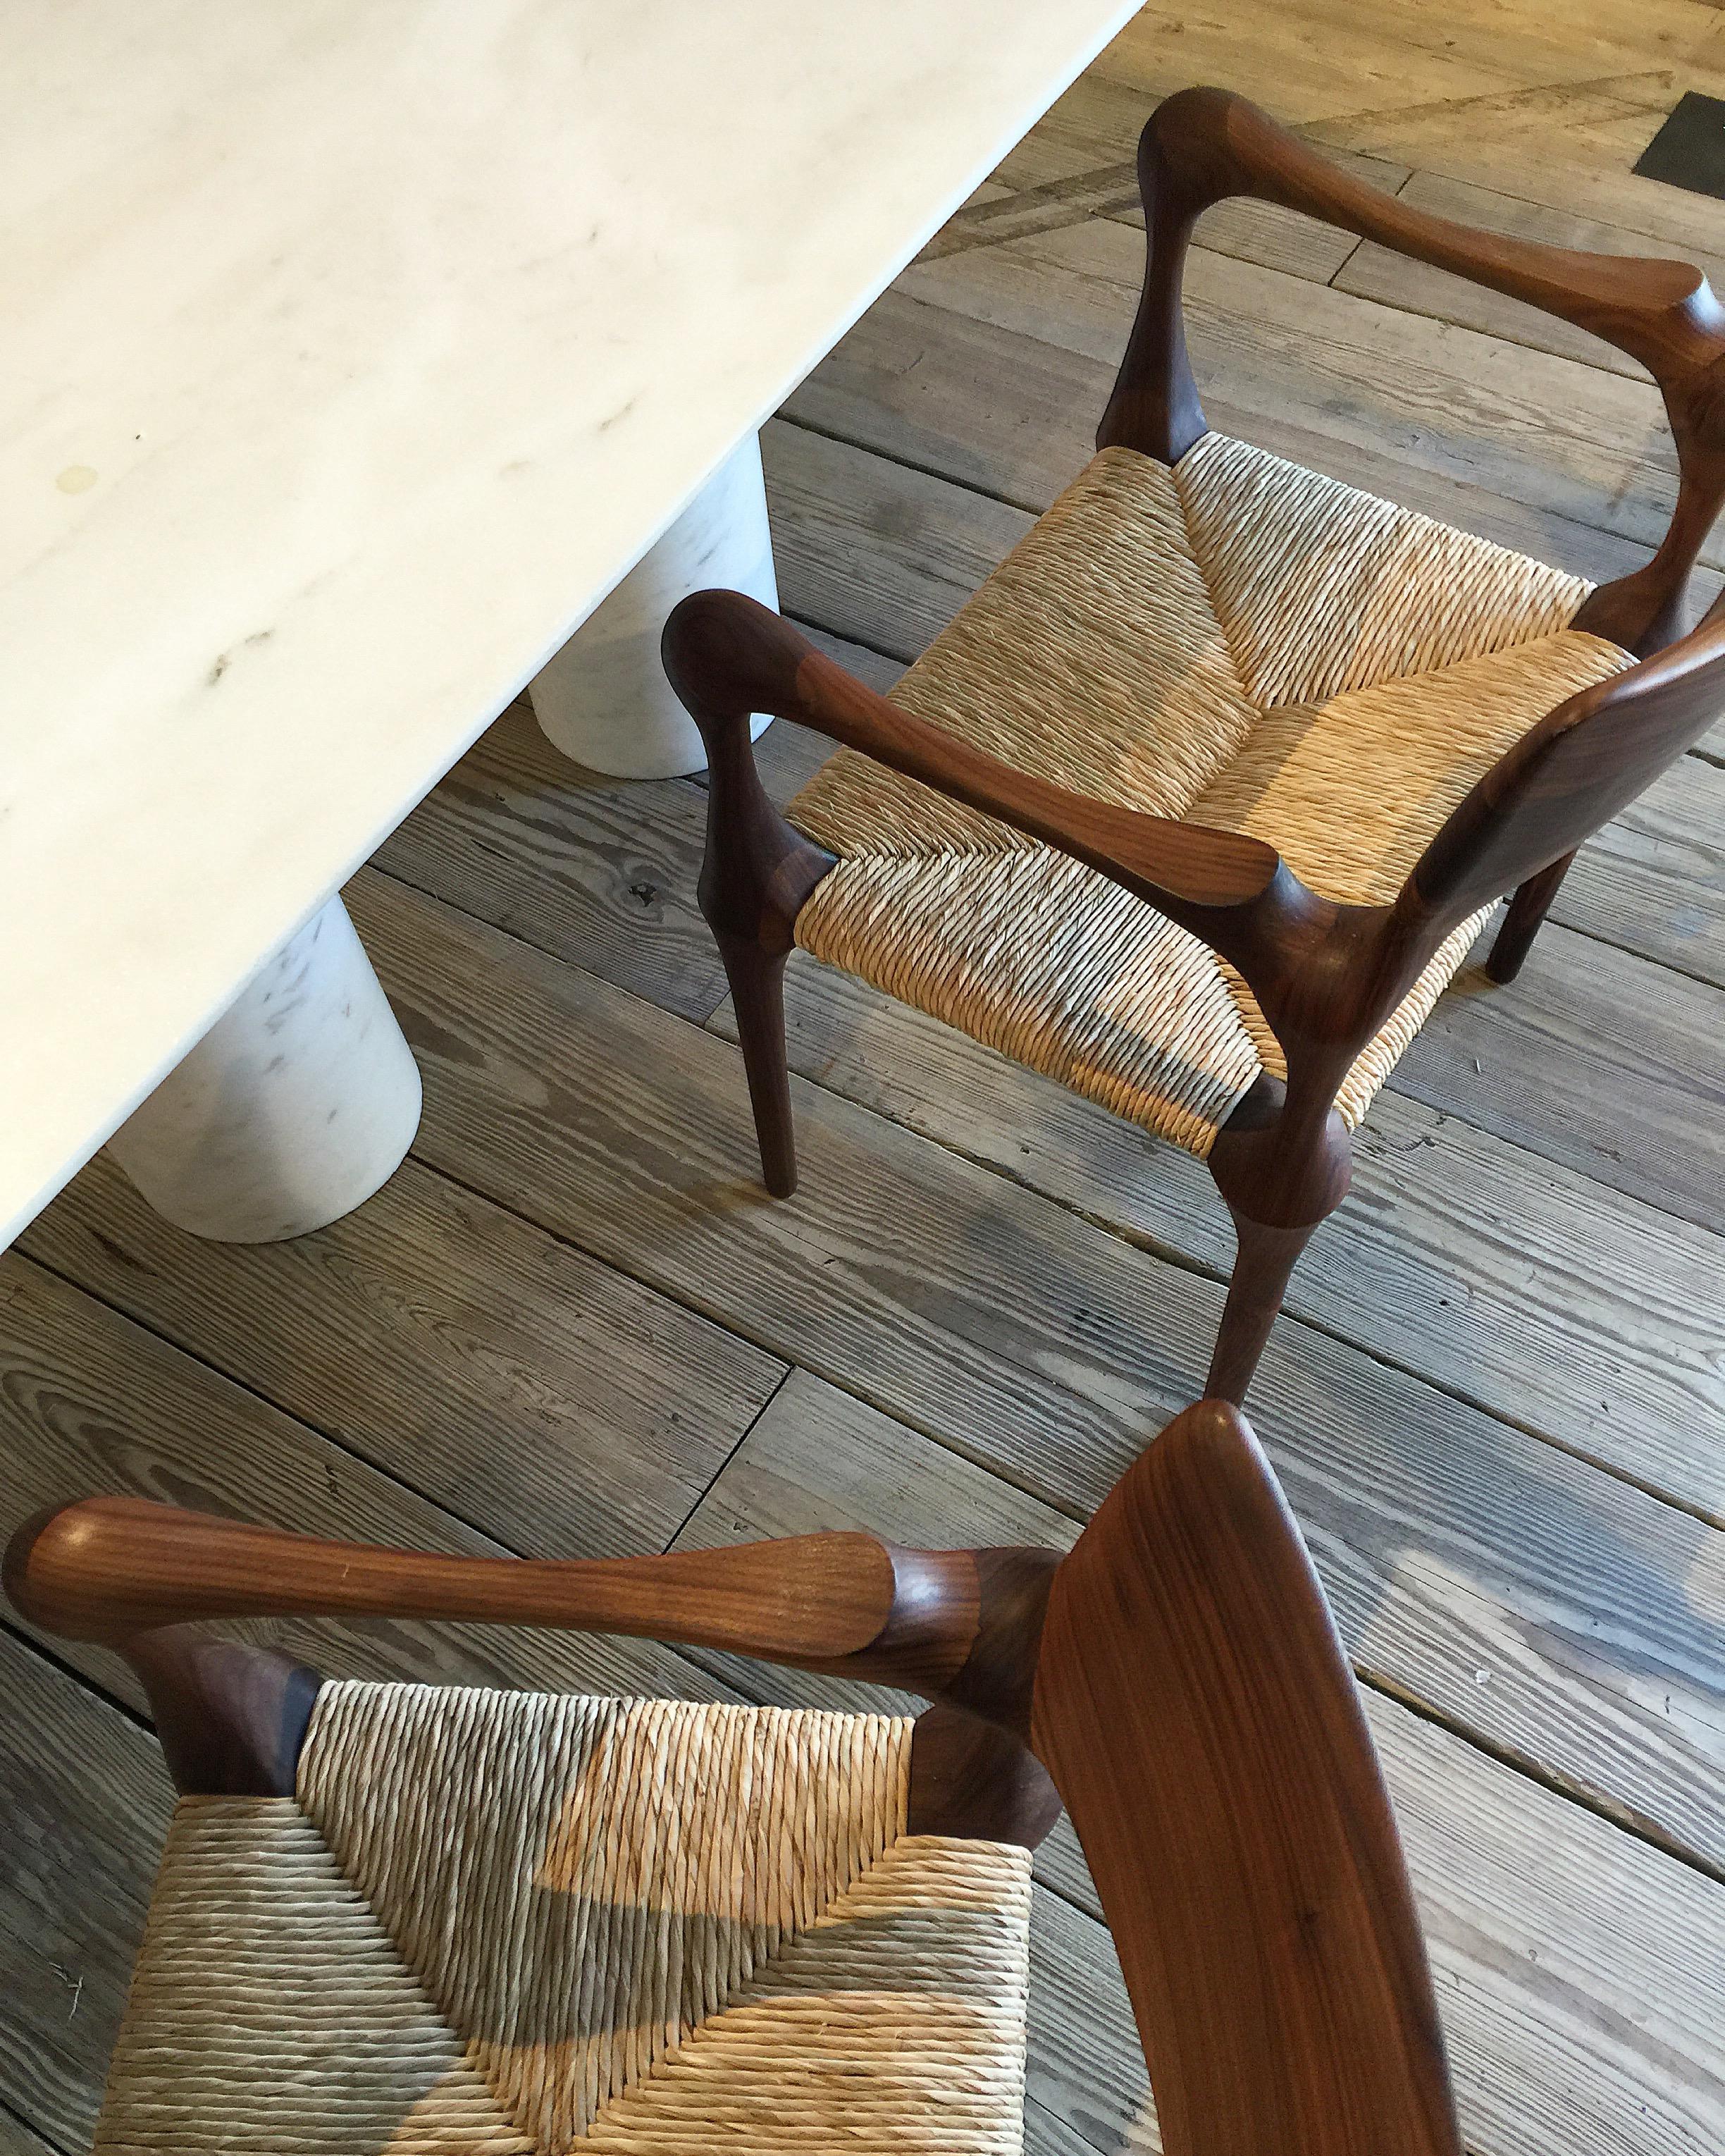 Knobby kneed walnut chairs with rush seats